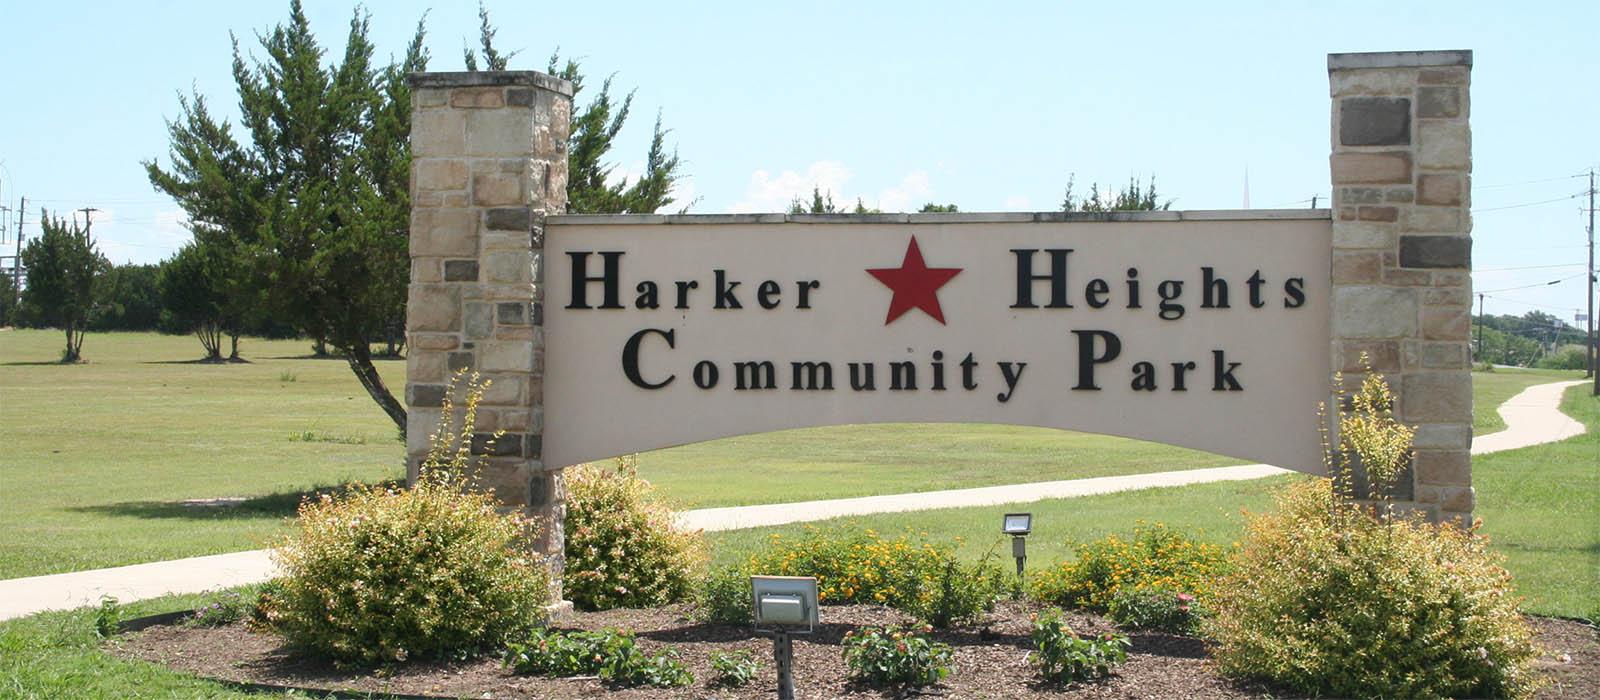 Harker Heights Community Park